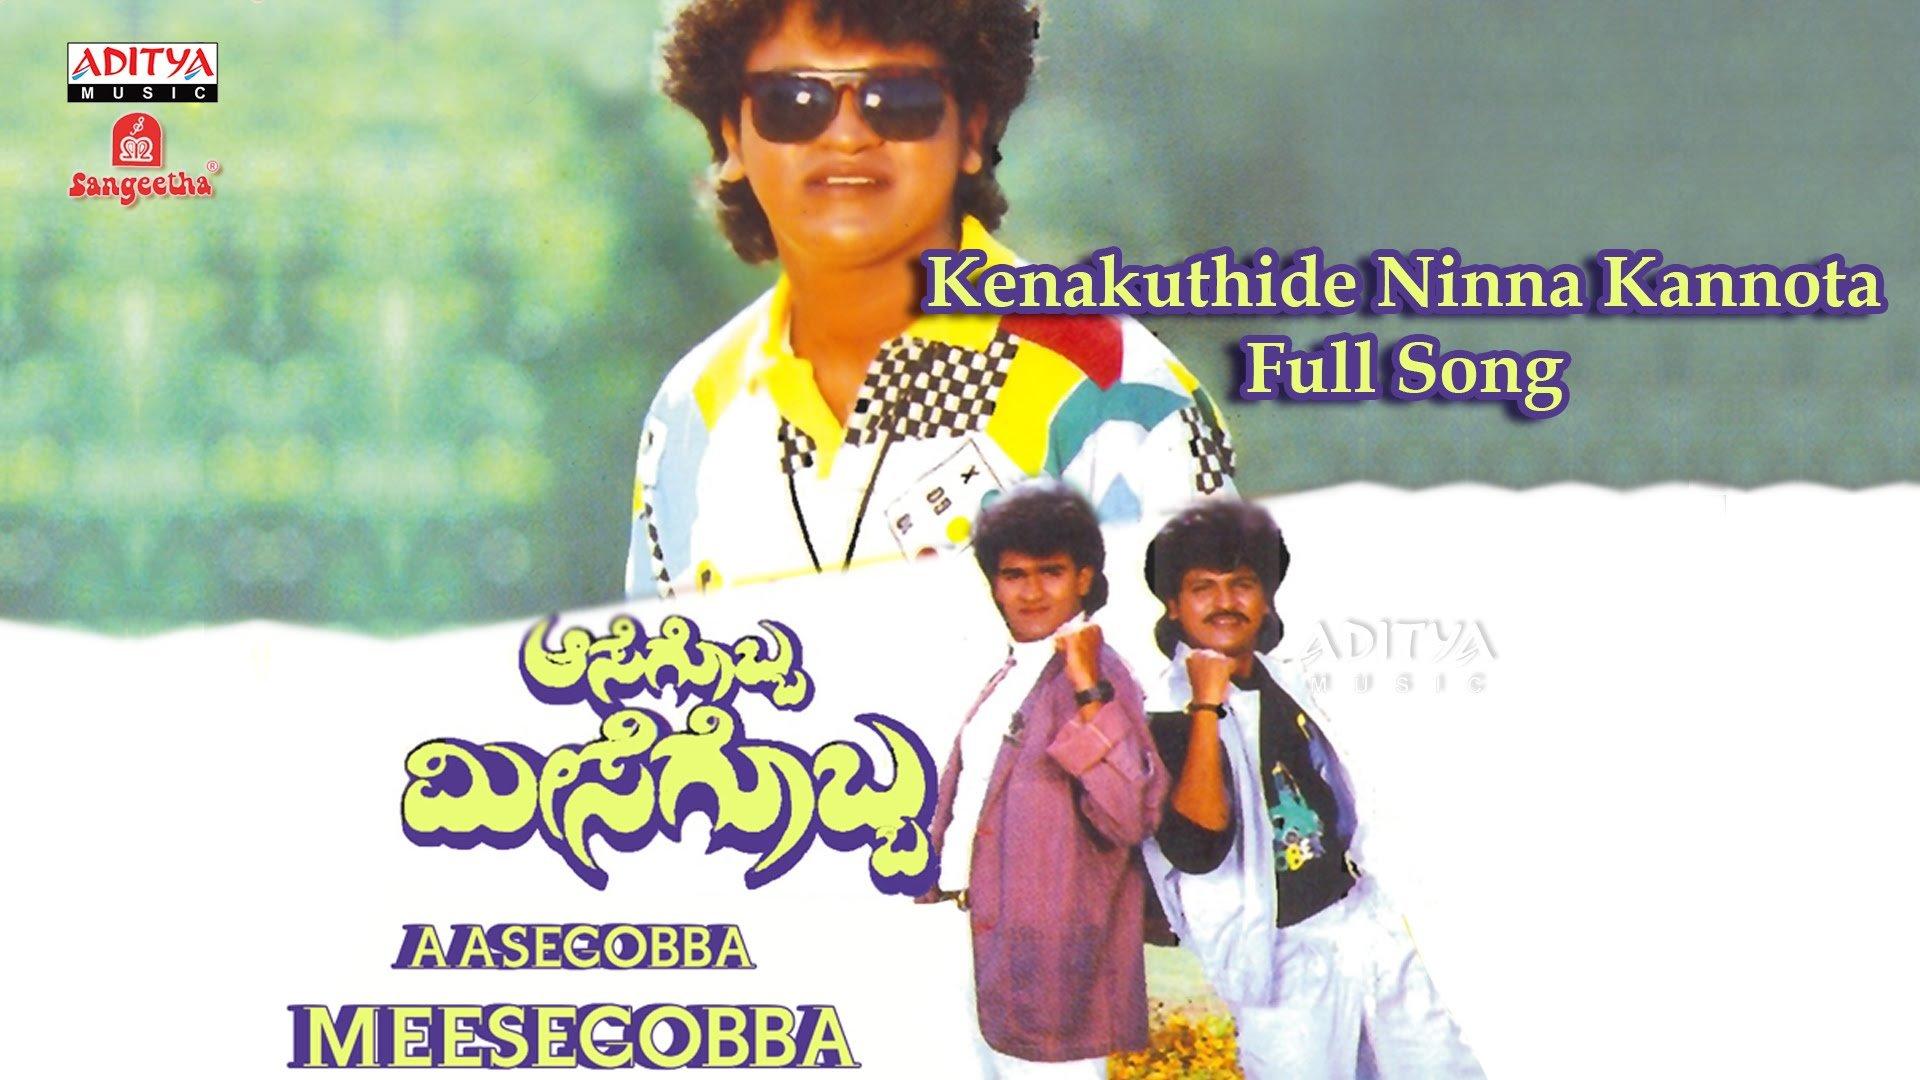 Aasegobba Meesegobba Movie Poster